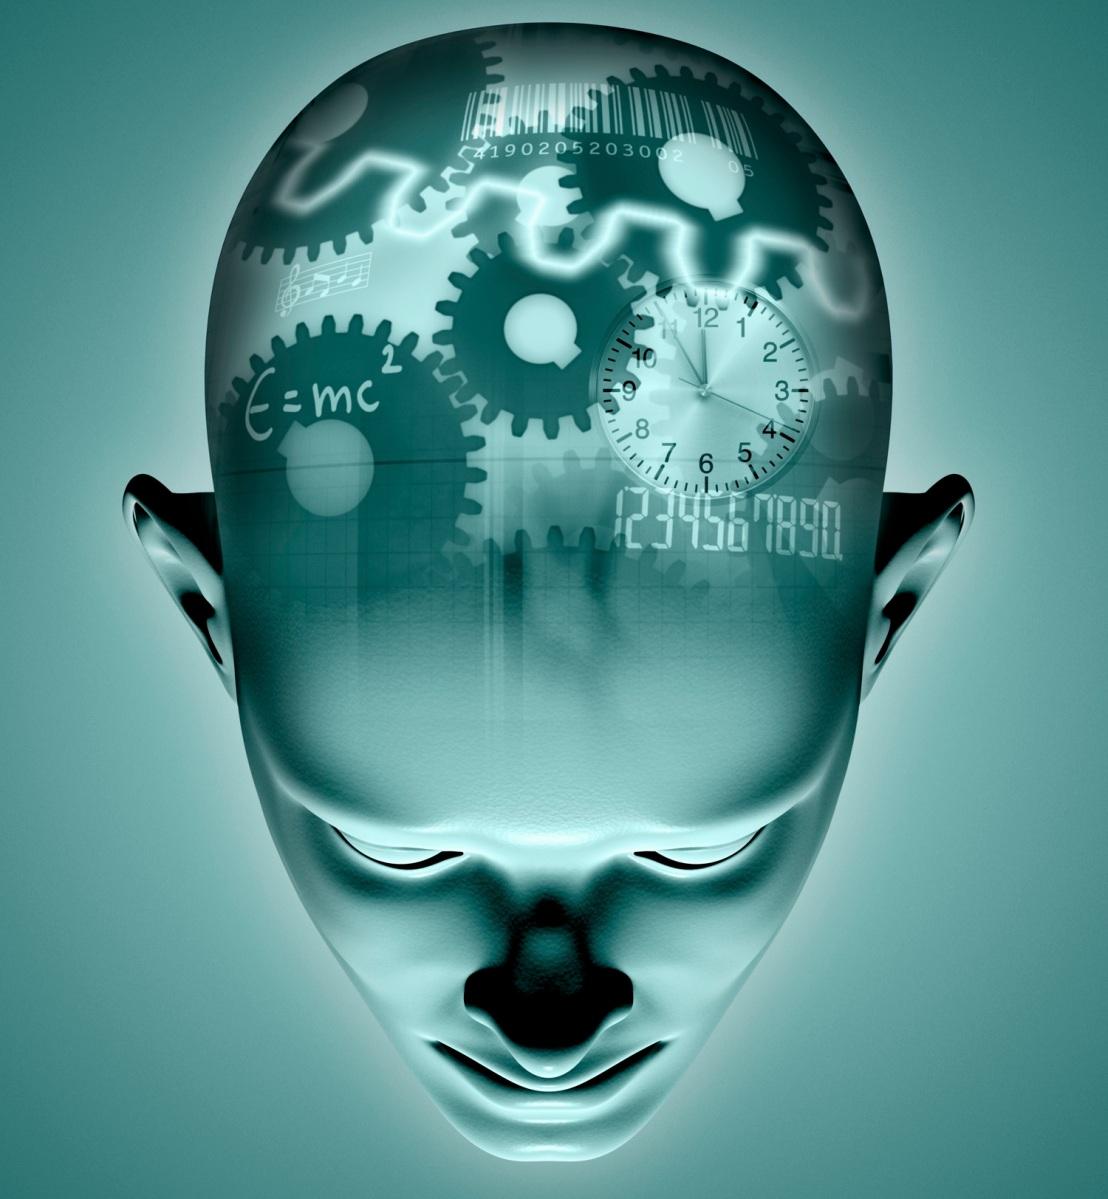 Daca intelegi cum functioneaza creierul, viata devine usoara